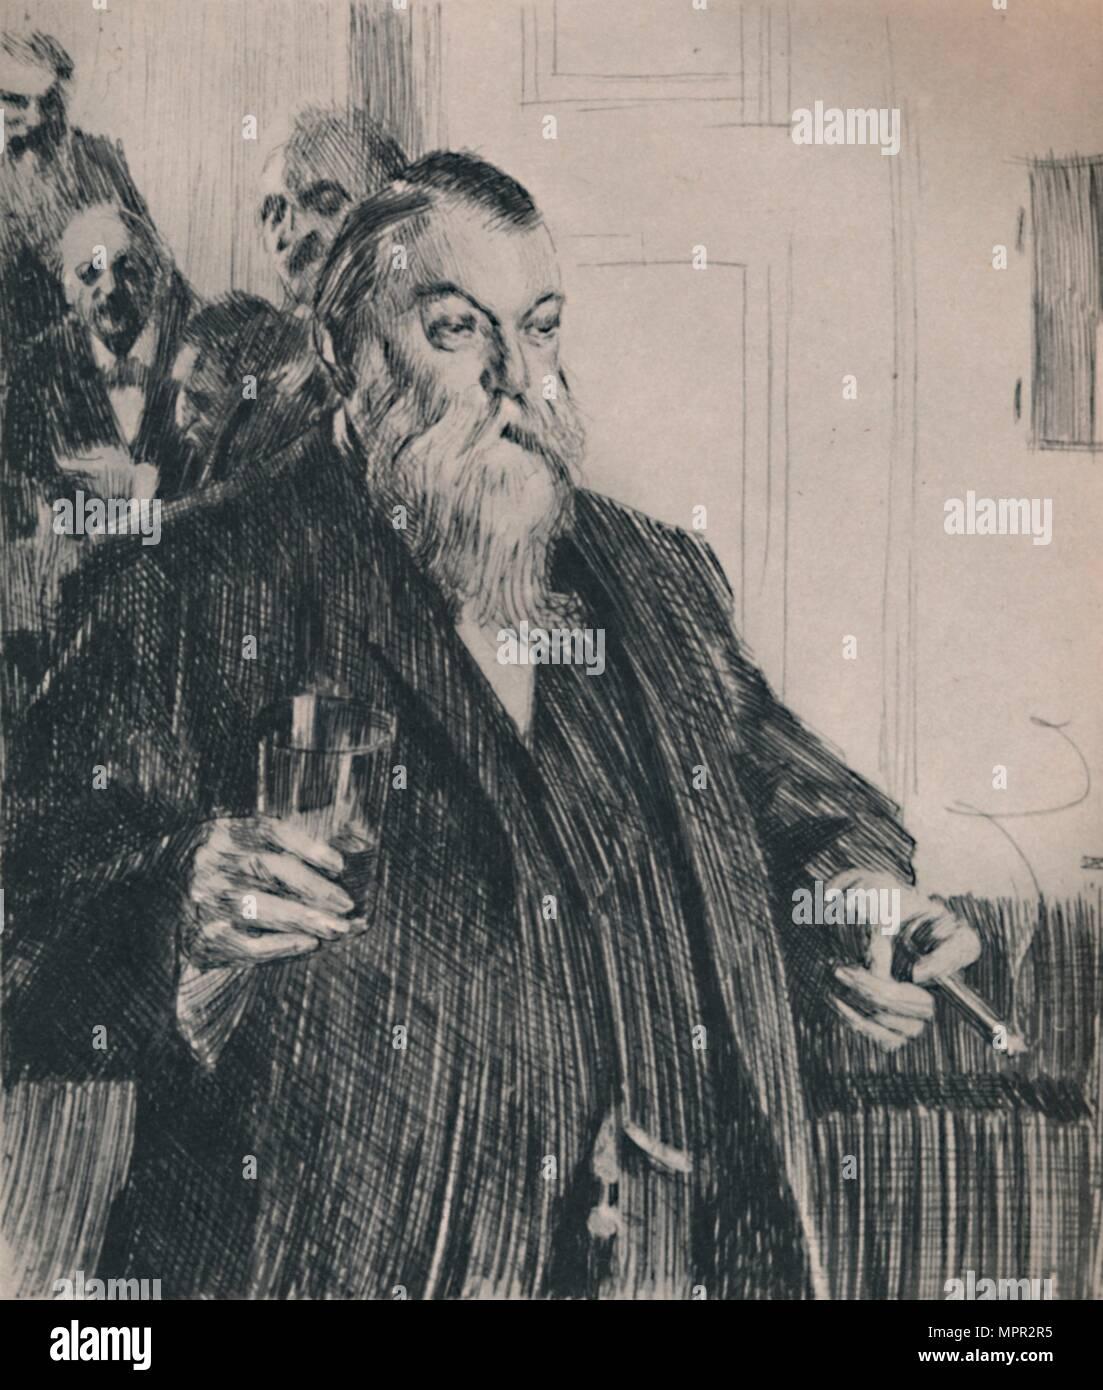 'The Toast', 1890s, (1946).  Artist: Anders Leonard Zorn. - Stock Image